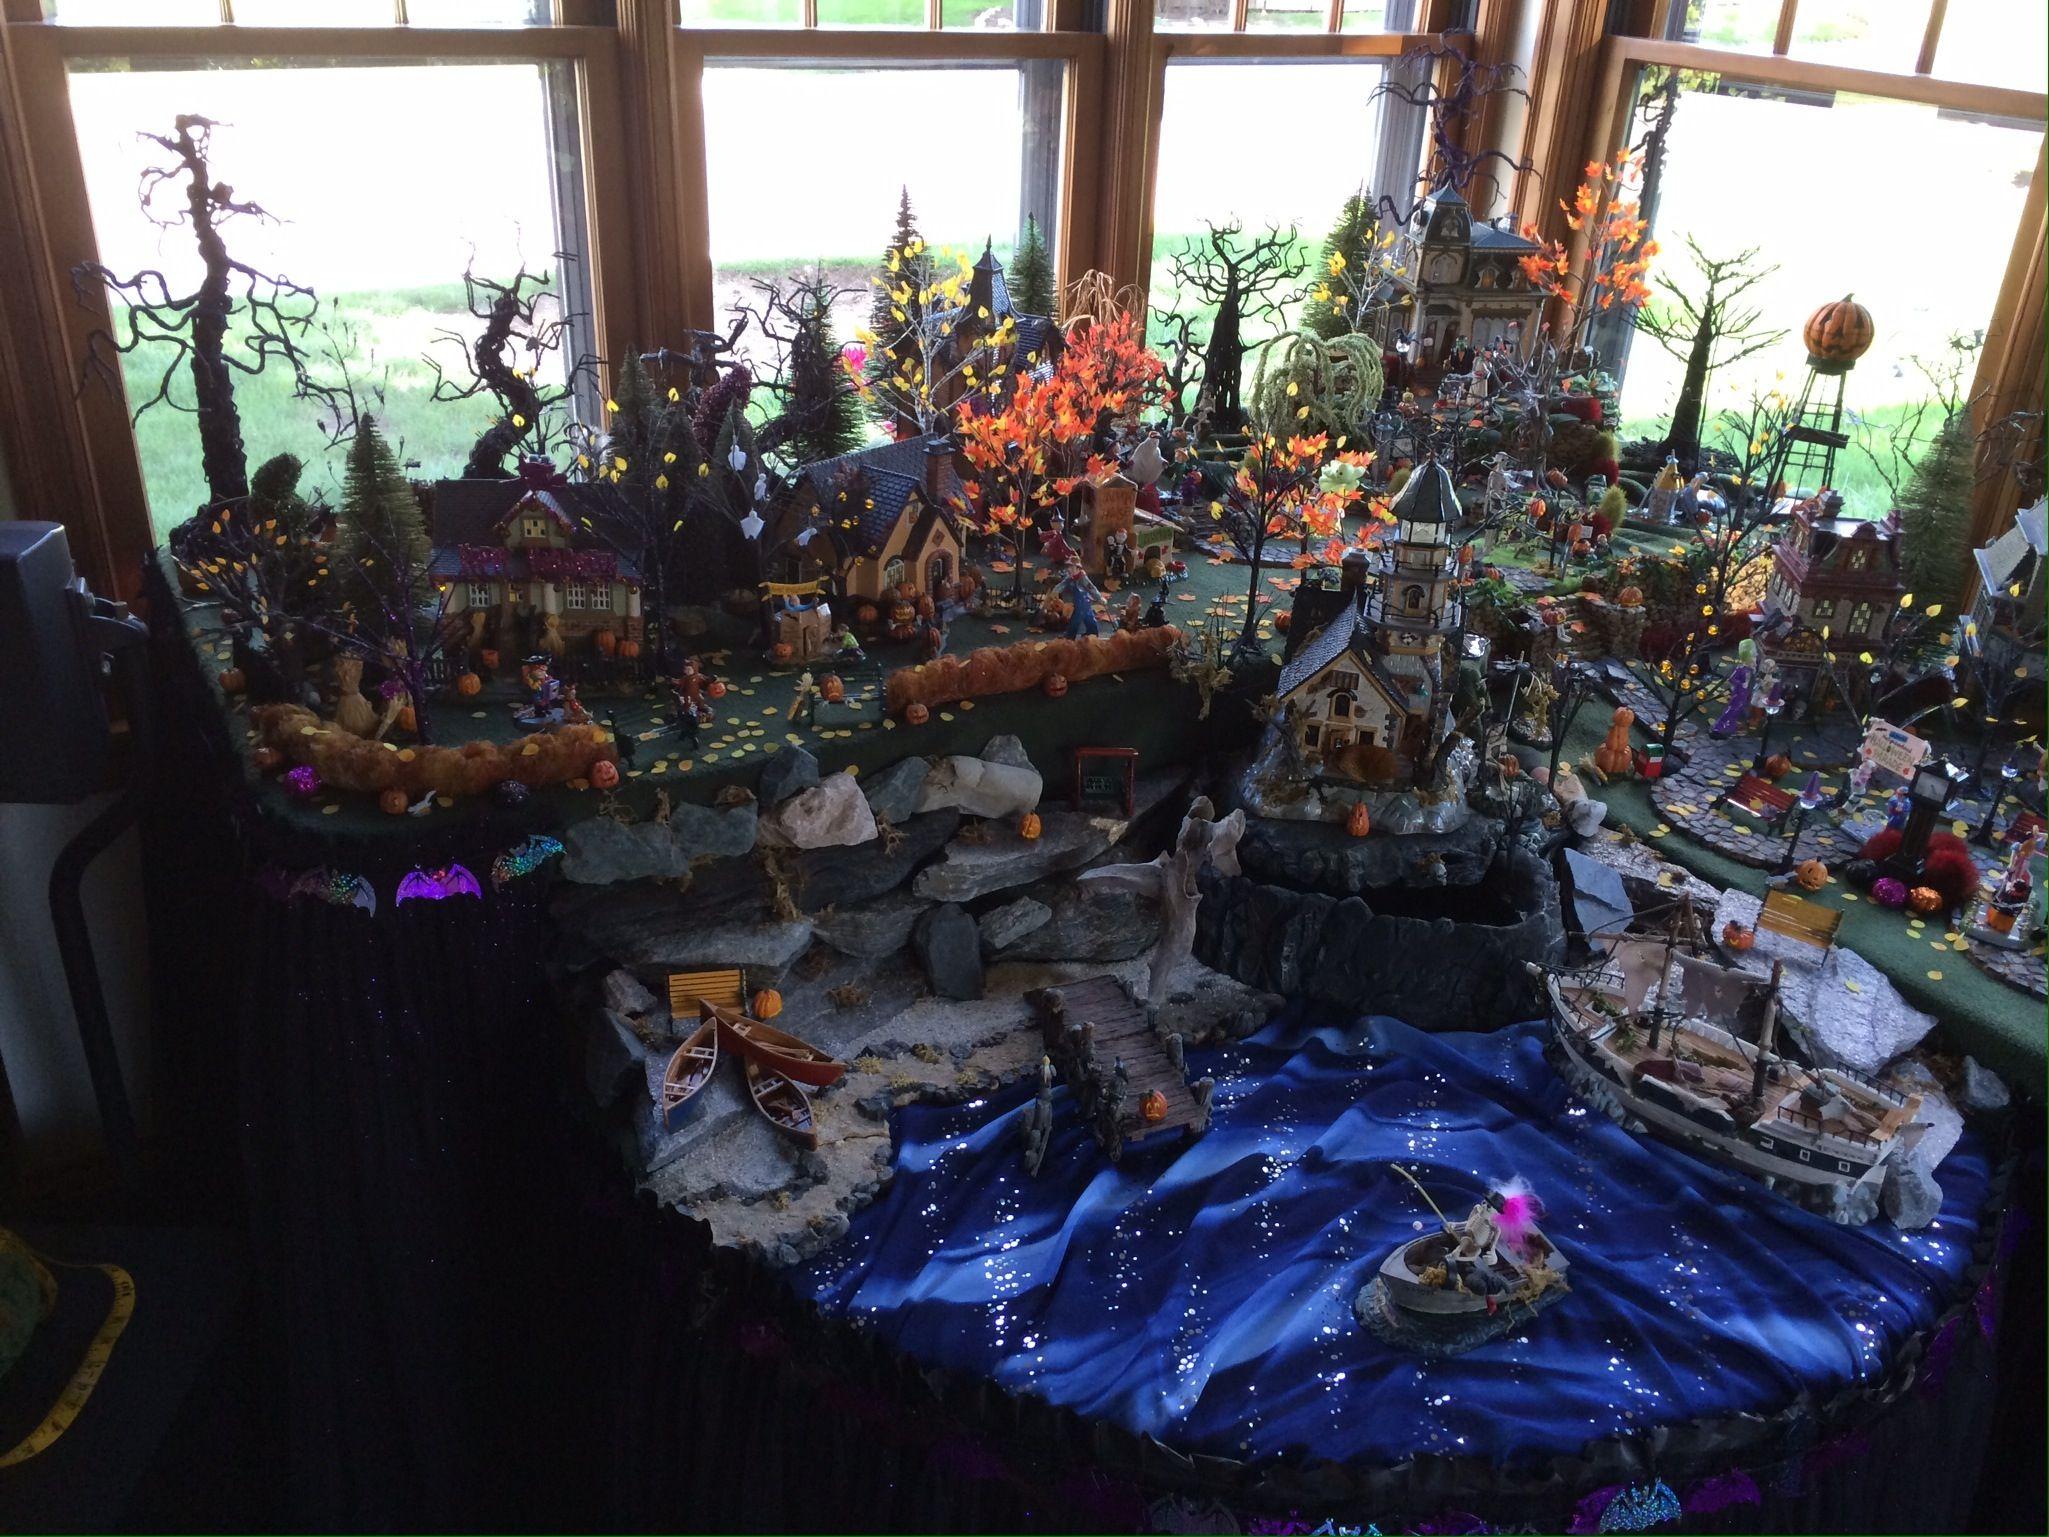 Department 56 dickens village display ideas - Great Display